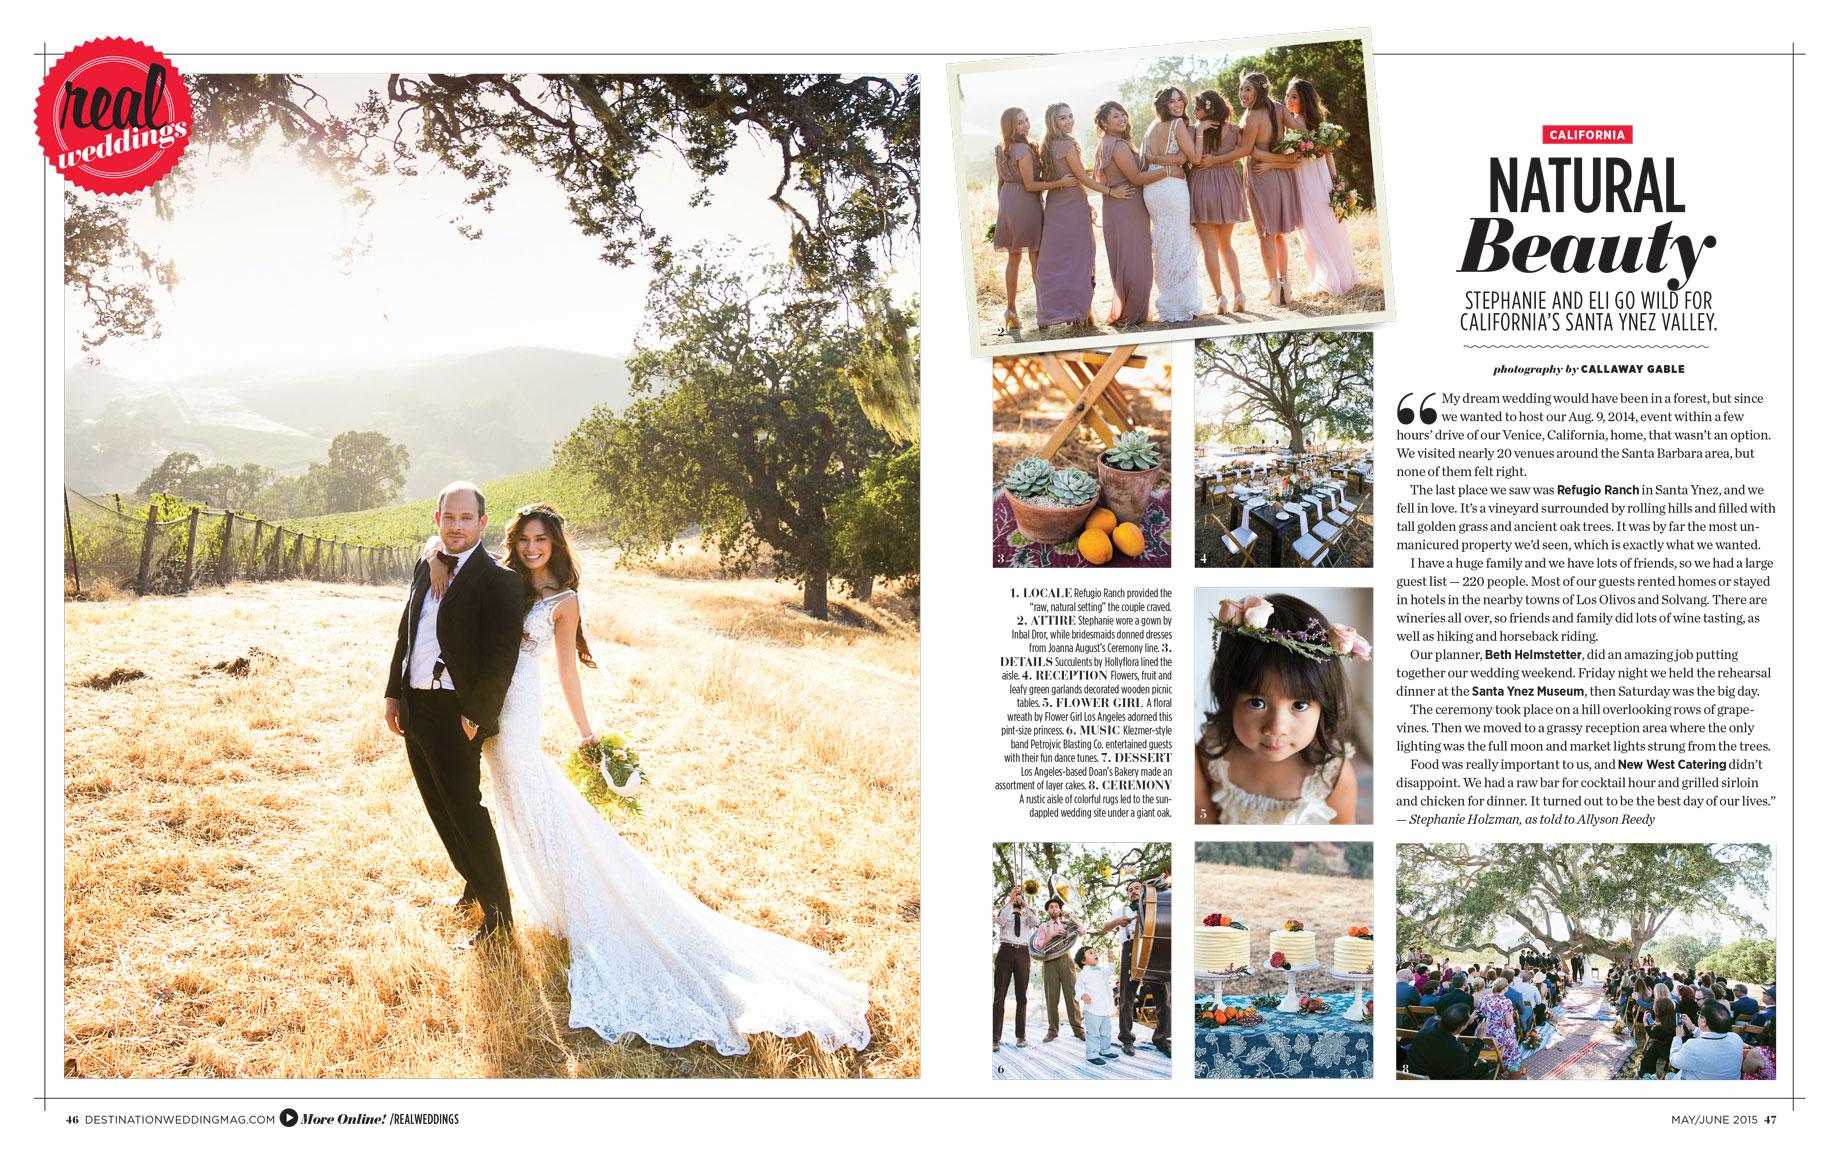 Refugio Ranch Wedding in Destination Weddings Magazine